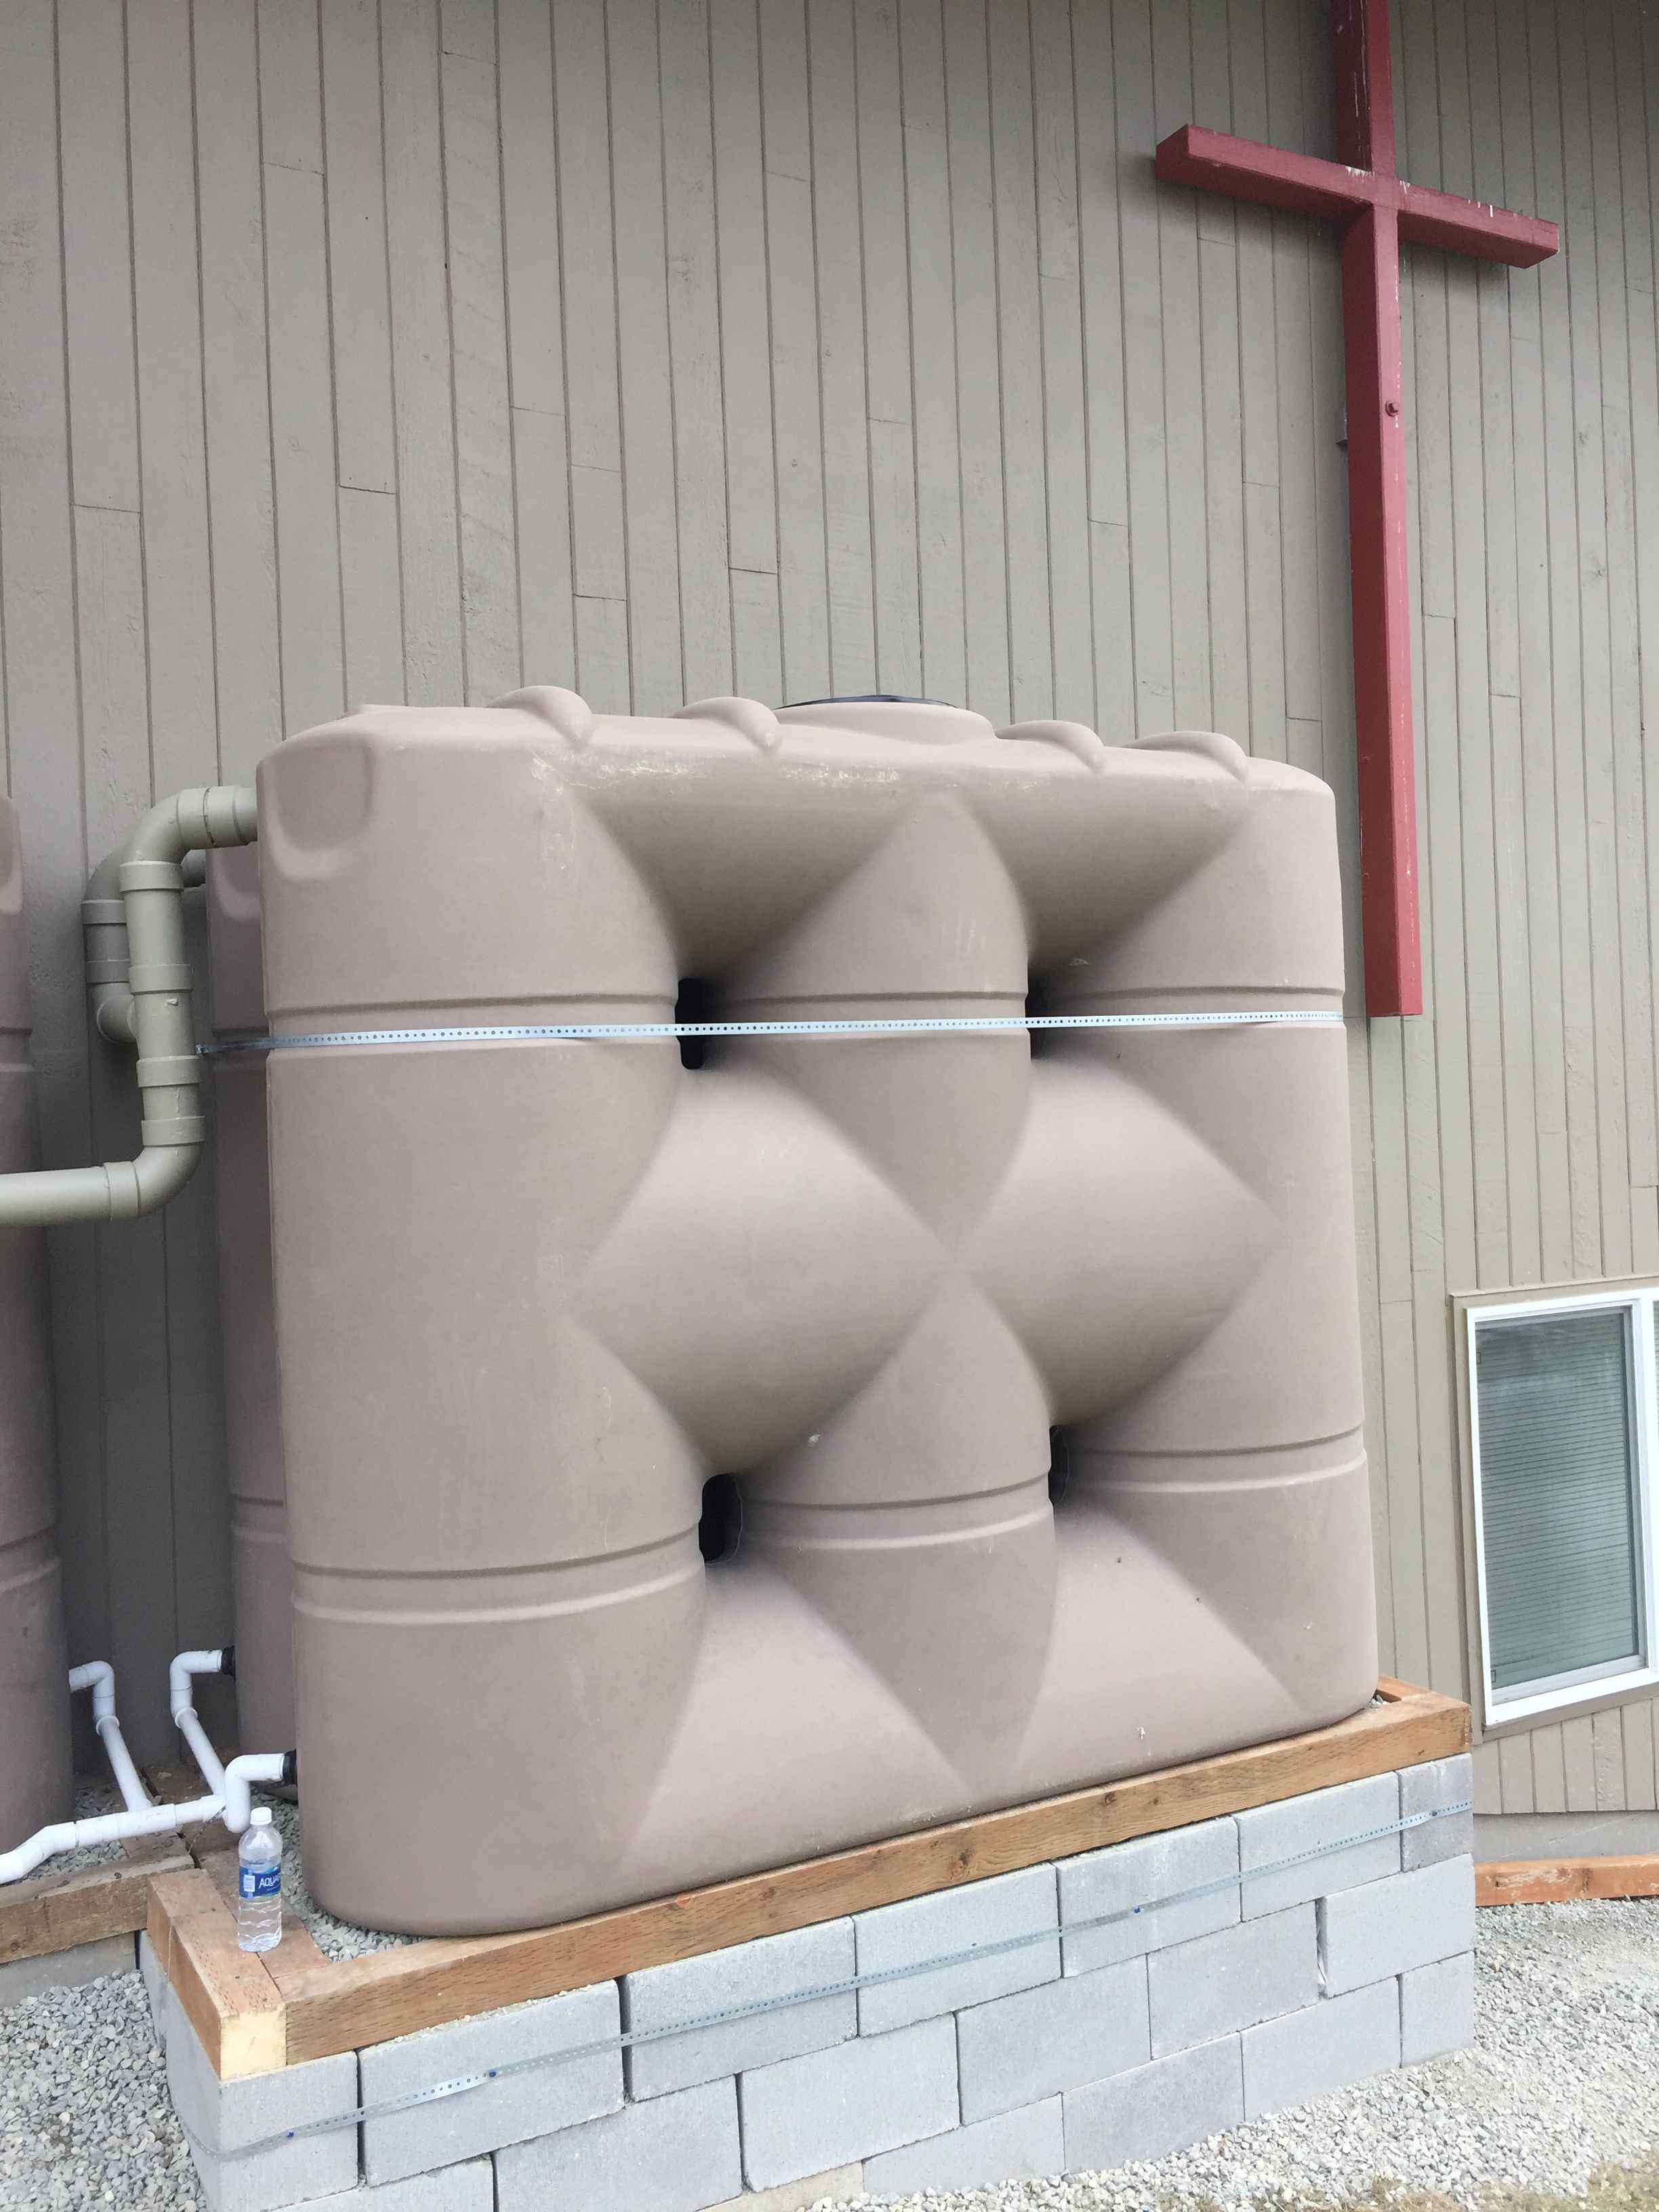 7 x 530 gallon rainwaterharvesting tanks with images